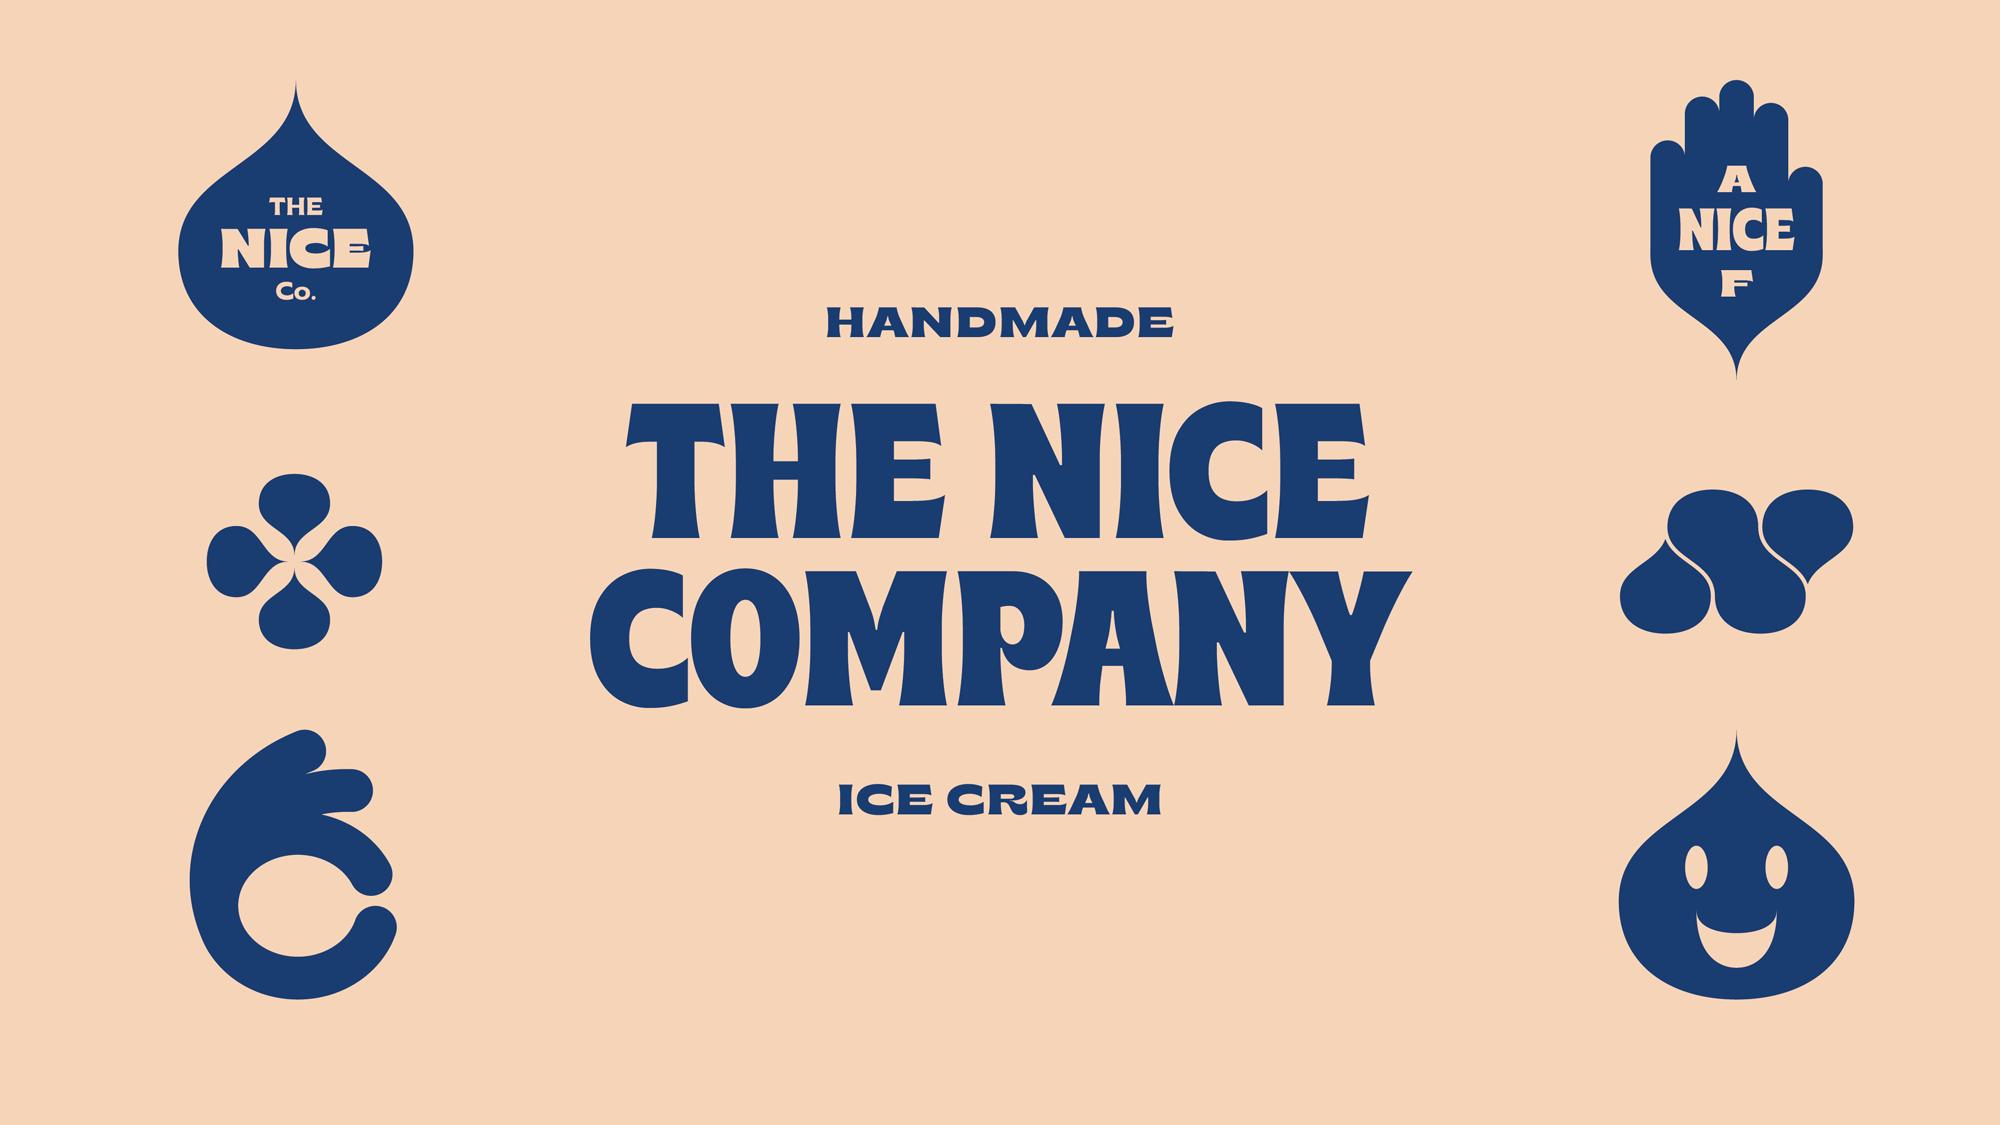 The Nice Company brand logo